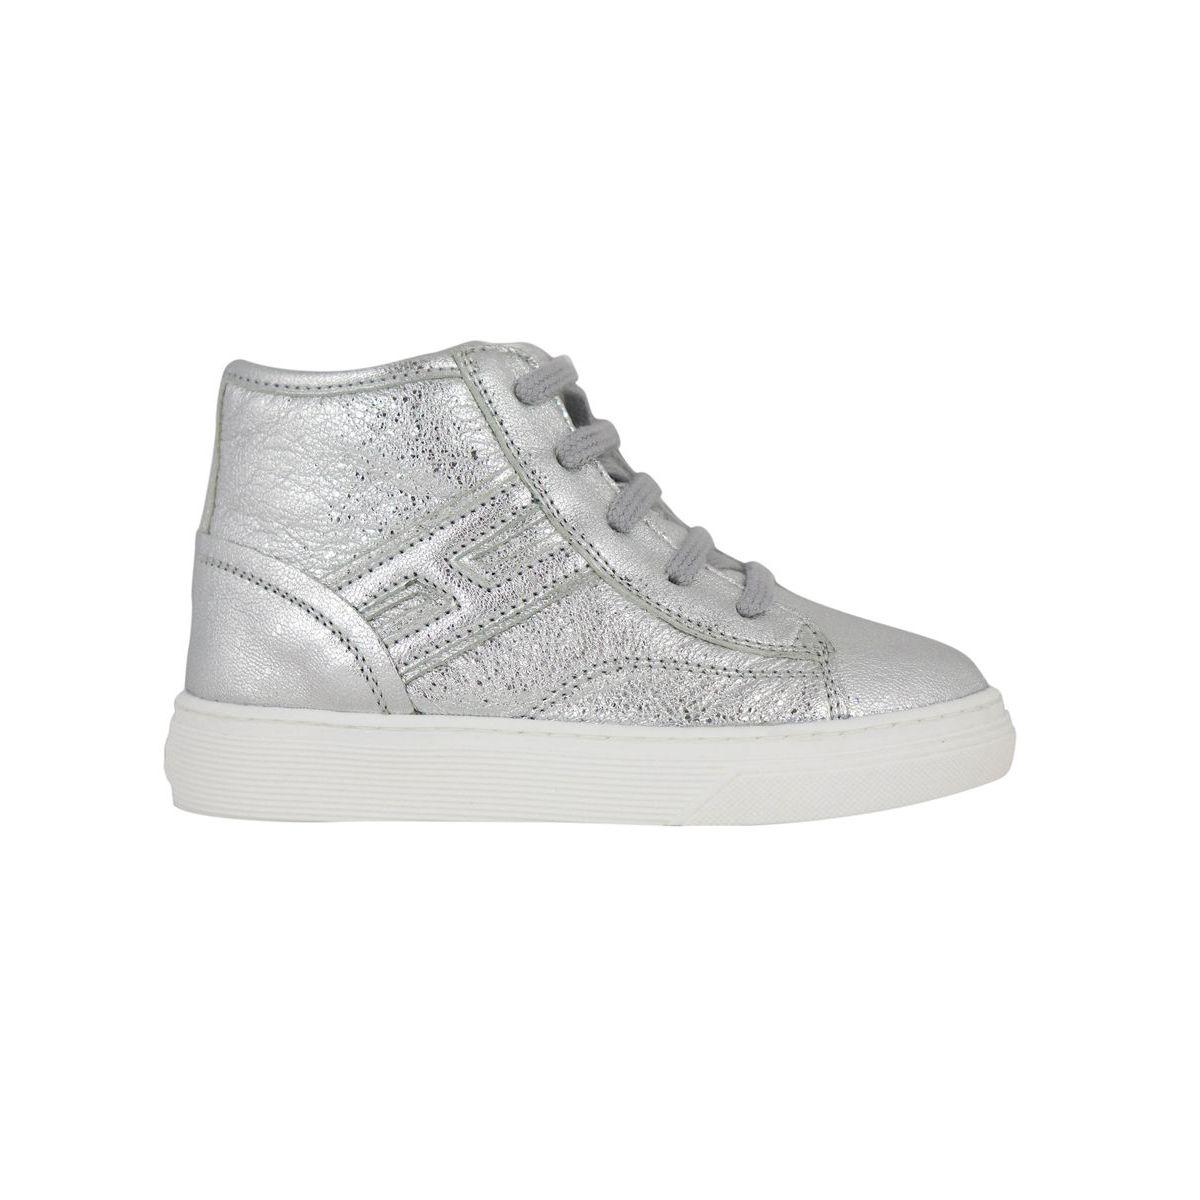 Sneakers Fondo 340 HI TOP Silver Hogan